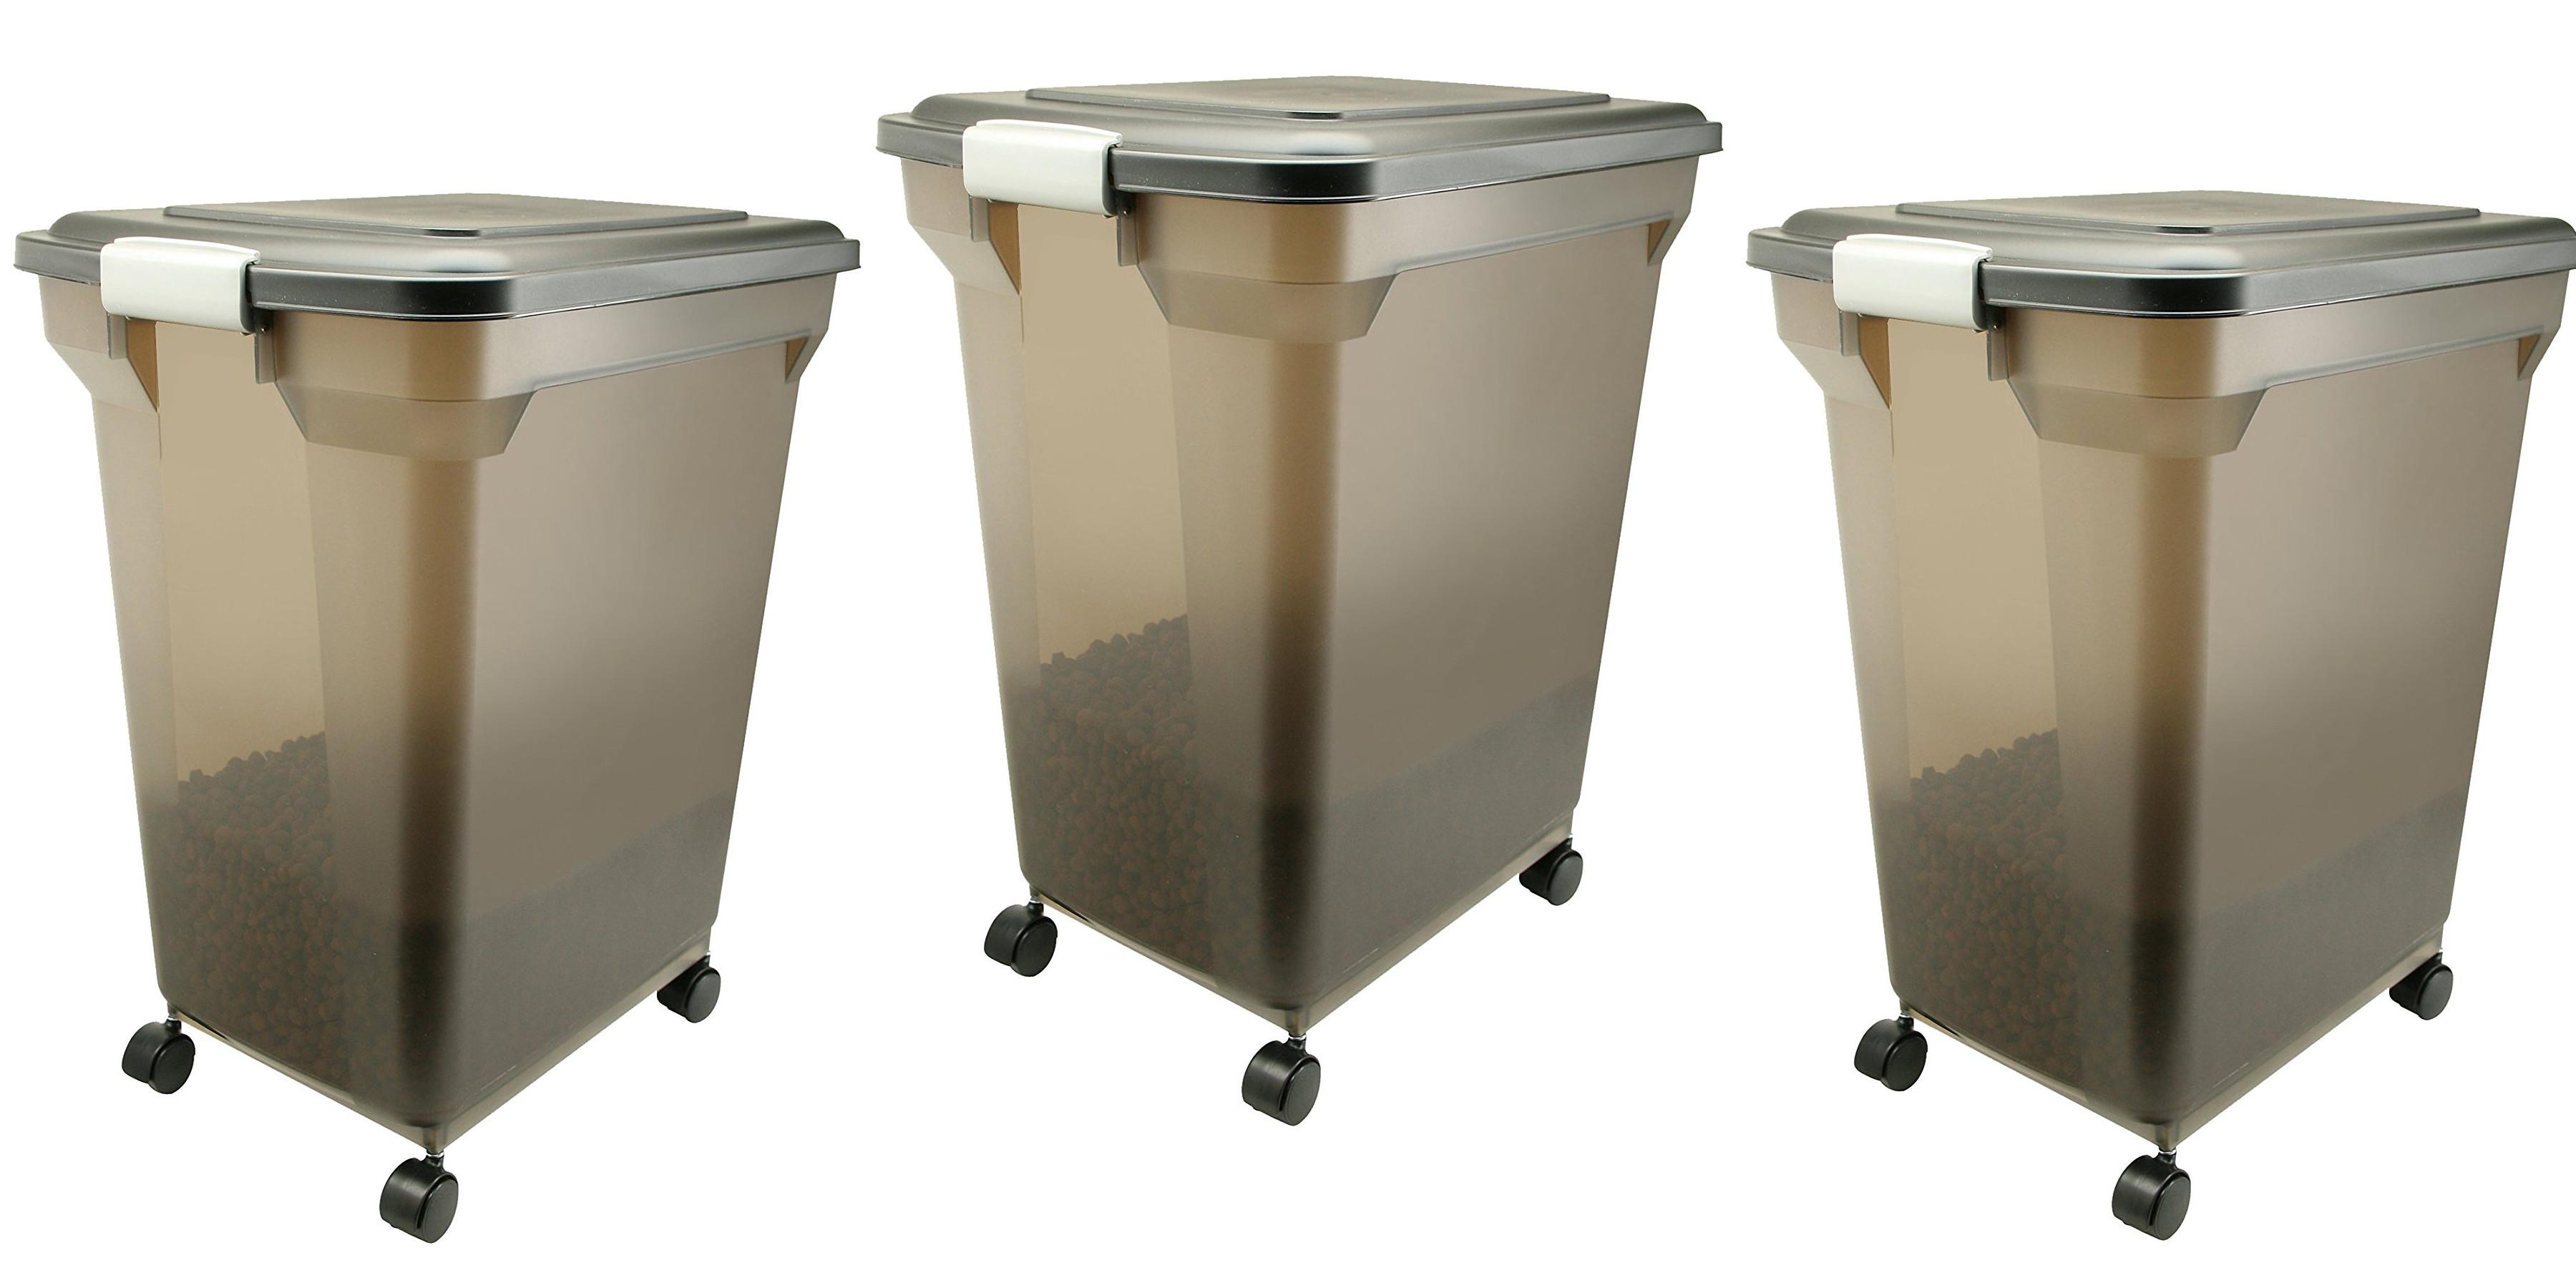 IRIS Premium 55 Lb. Airtight Pet Food Storage Container Now Under $20 Prime  Shipped